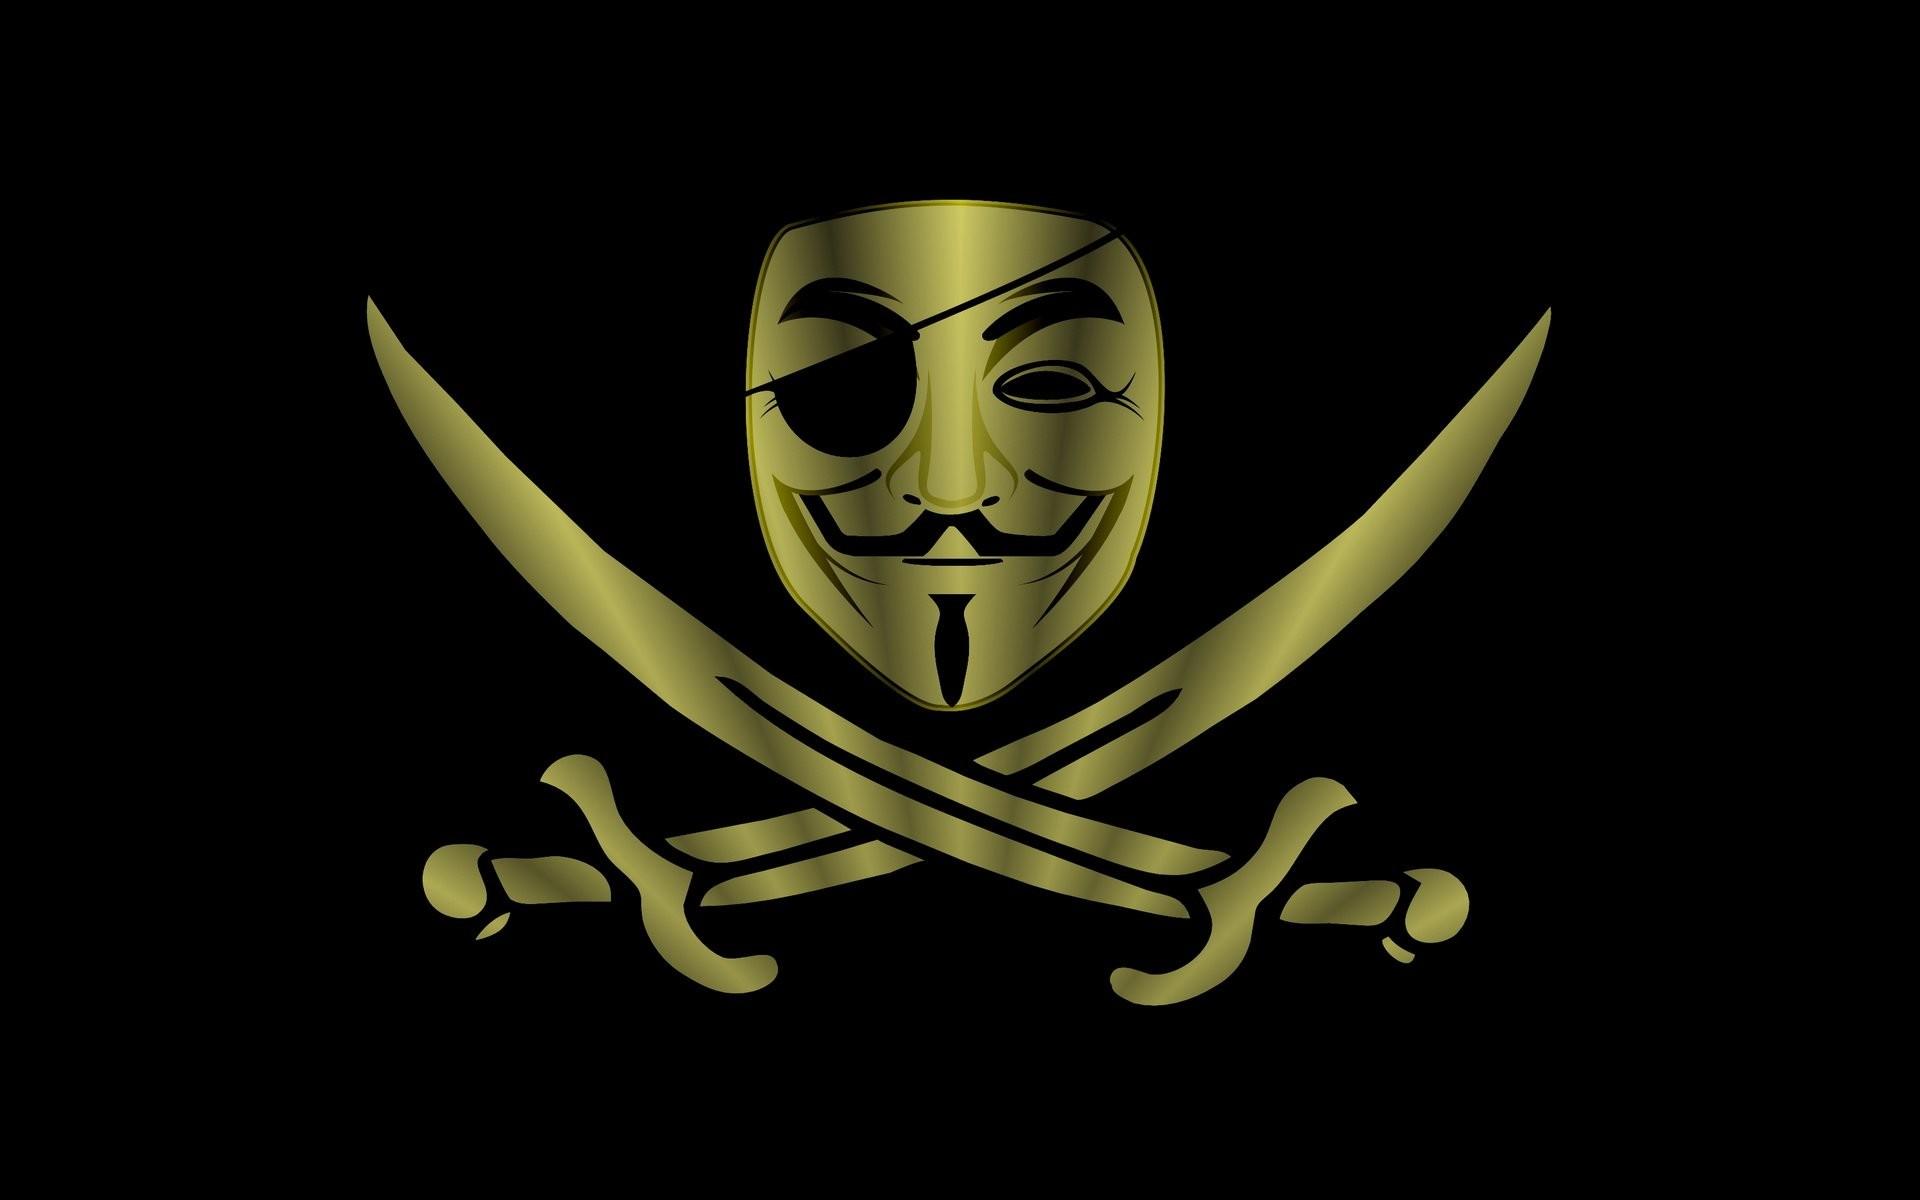 … wallpaper; anonymous mask sadic dark anarchy hacker hacking vendetta …